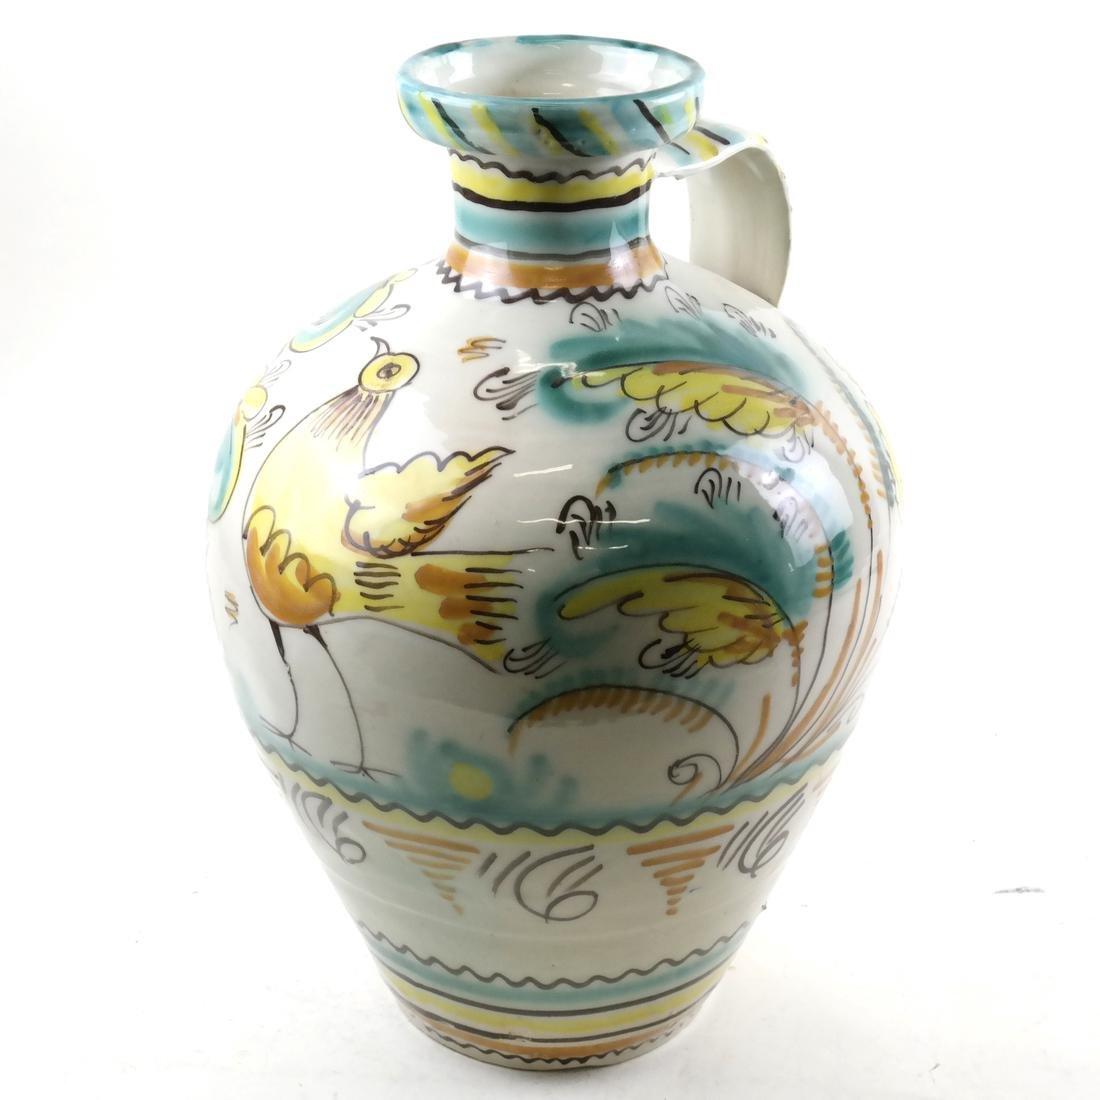 Contemporary Ewer Form Vase